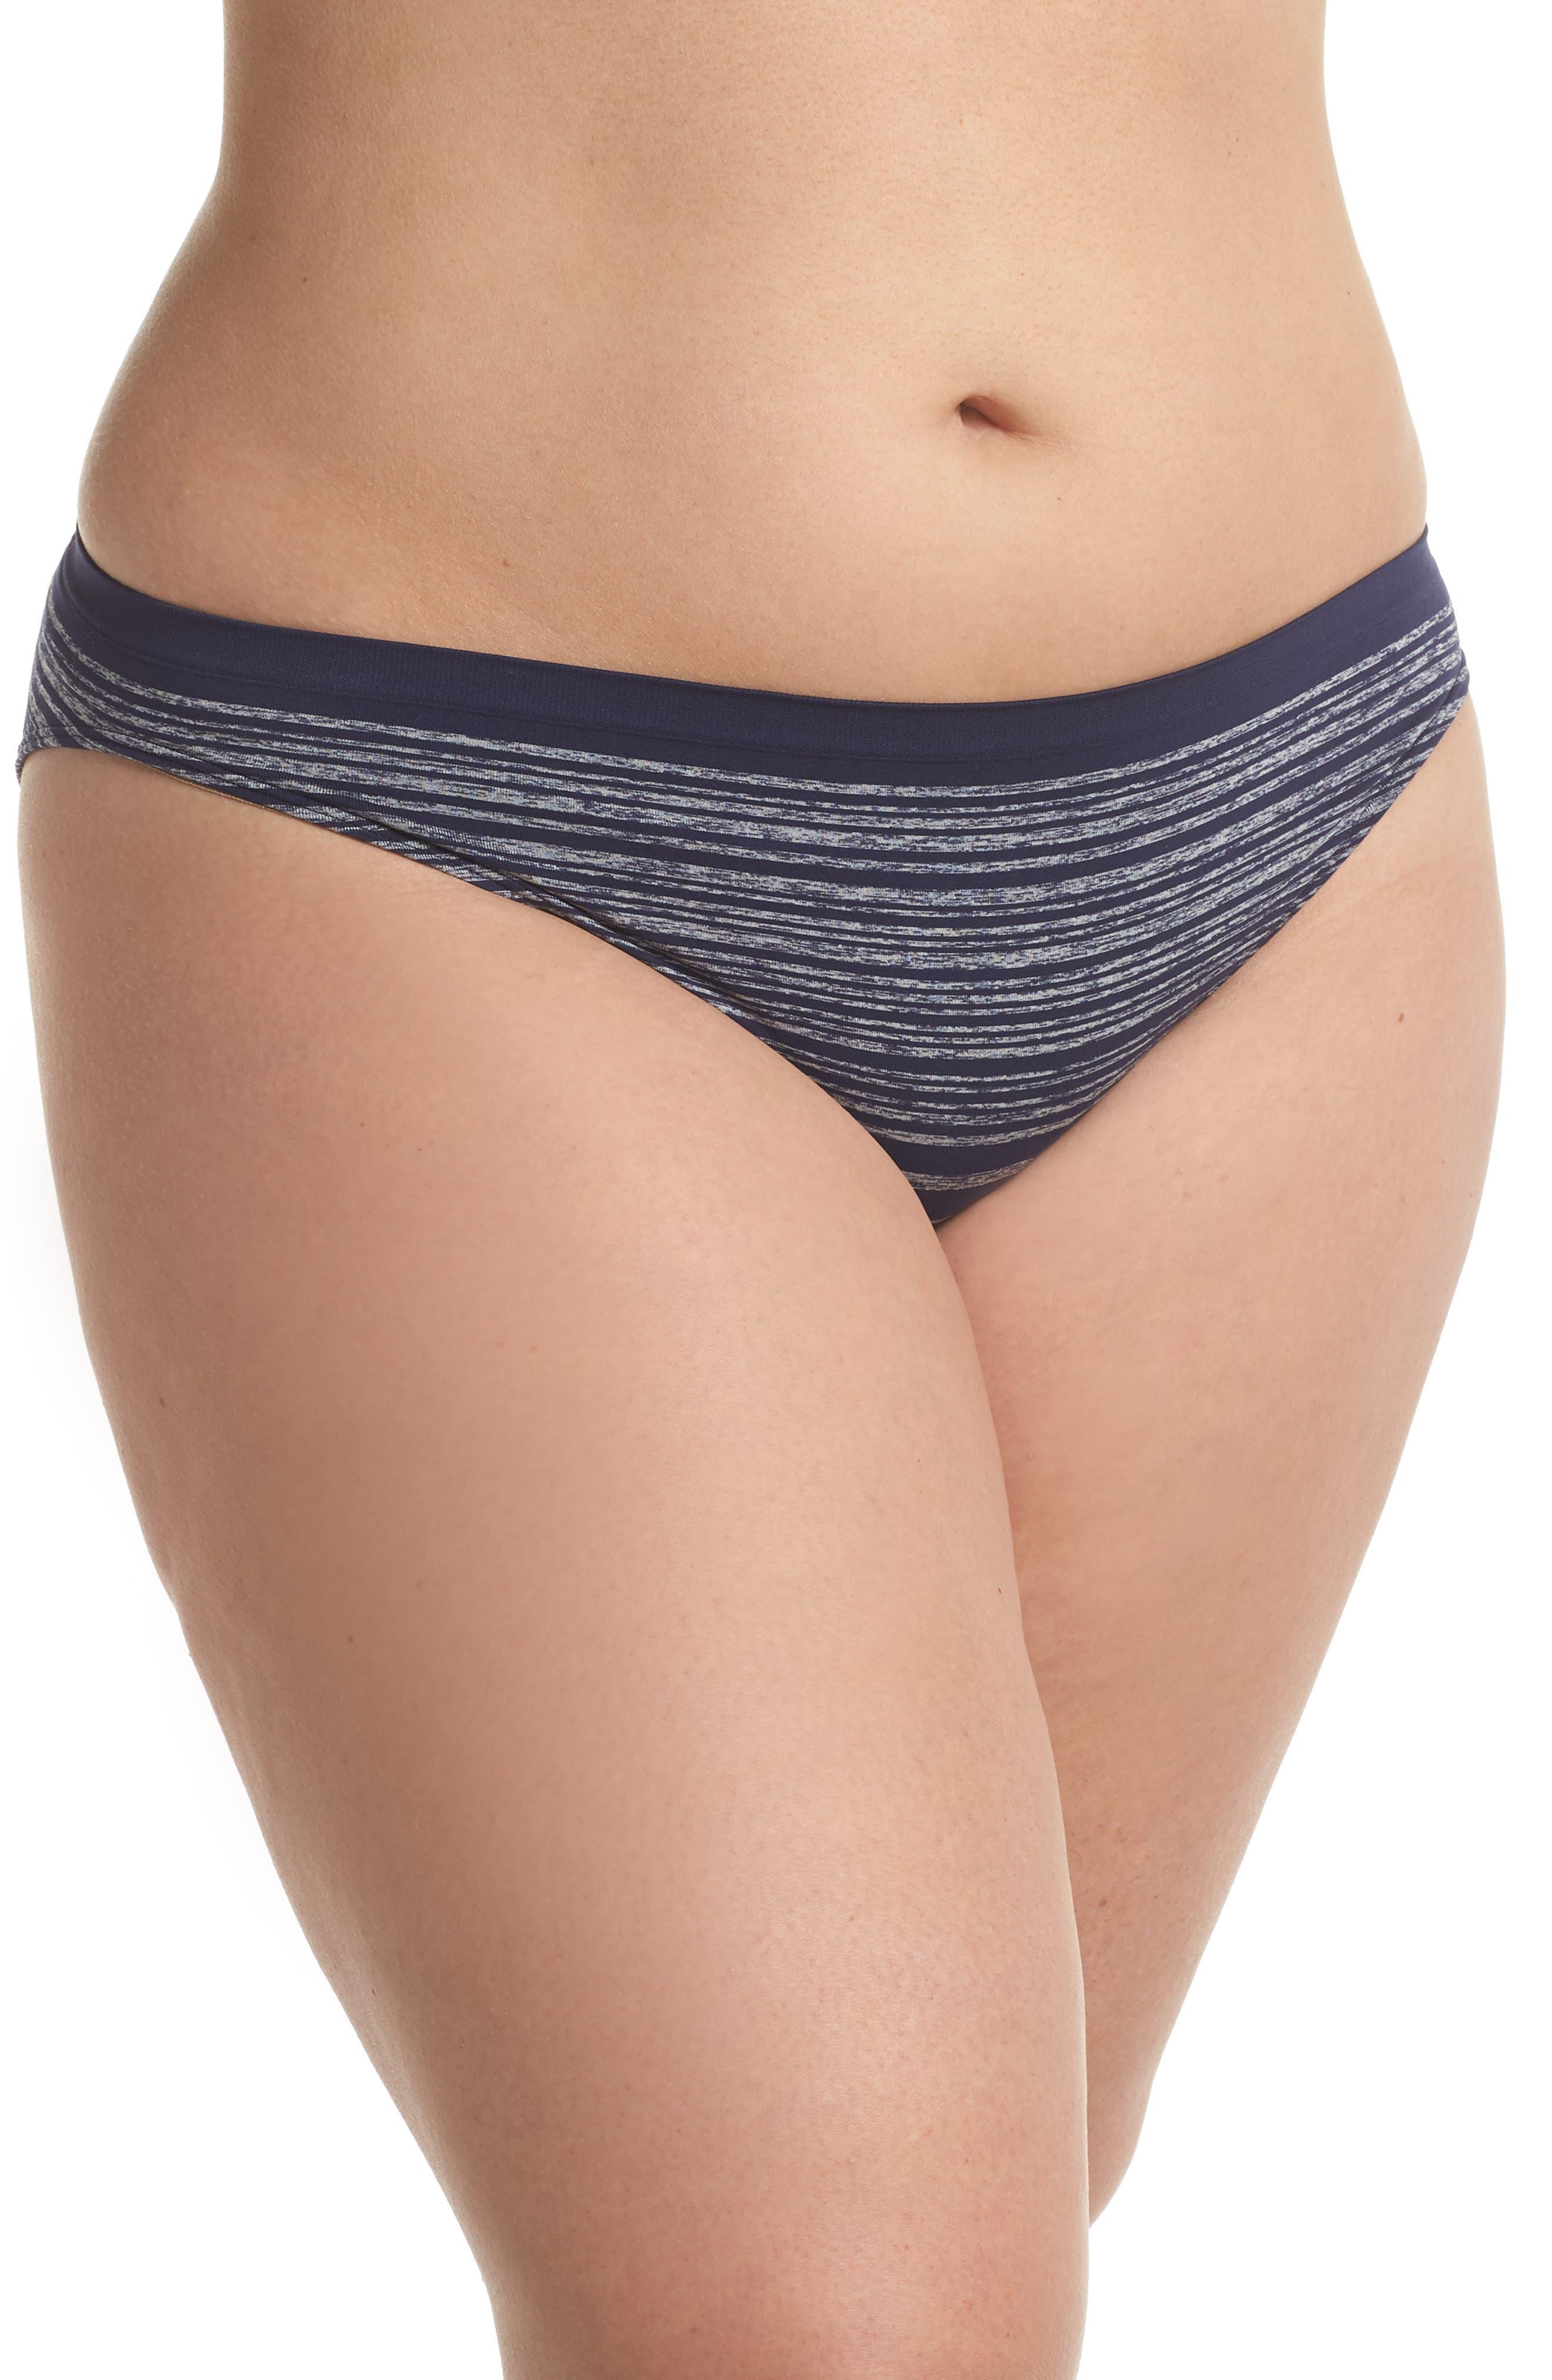 Seamless Bikini,                         Main,                         color, Navy Peacoat Heather Stripe